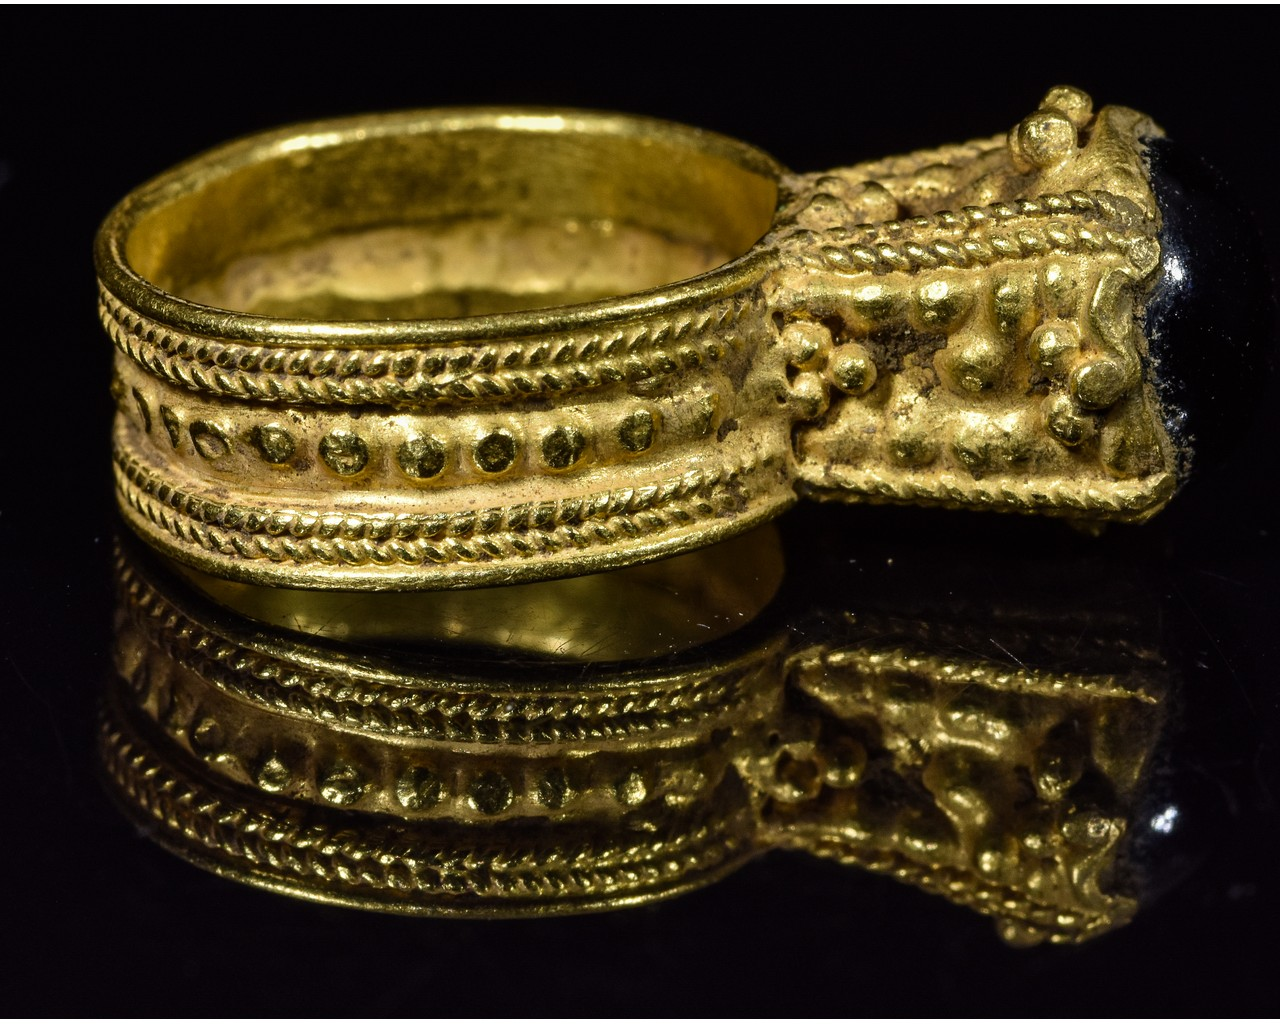 MEROVINGIAN GOLD RING WITH GARNET STONE - Image 5 of 5